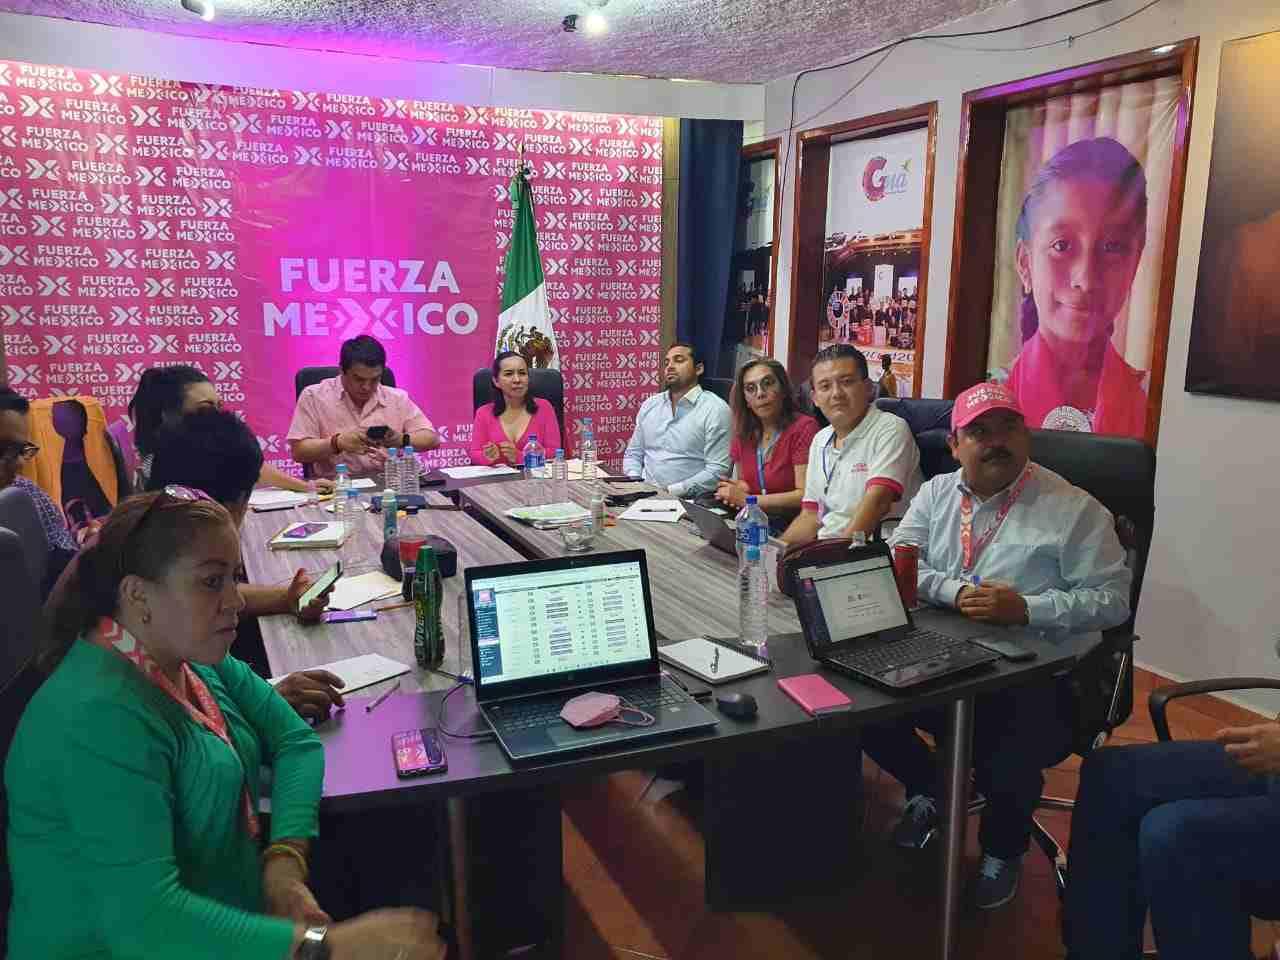 FUERZA POR MÉXICO PROTESTA POR CANCELACIÓN DE CANDIDATURAS